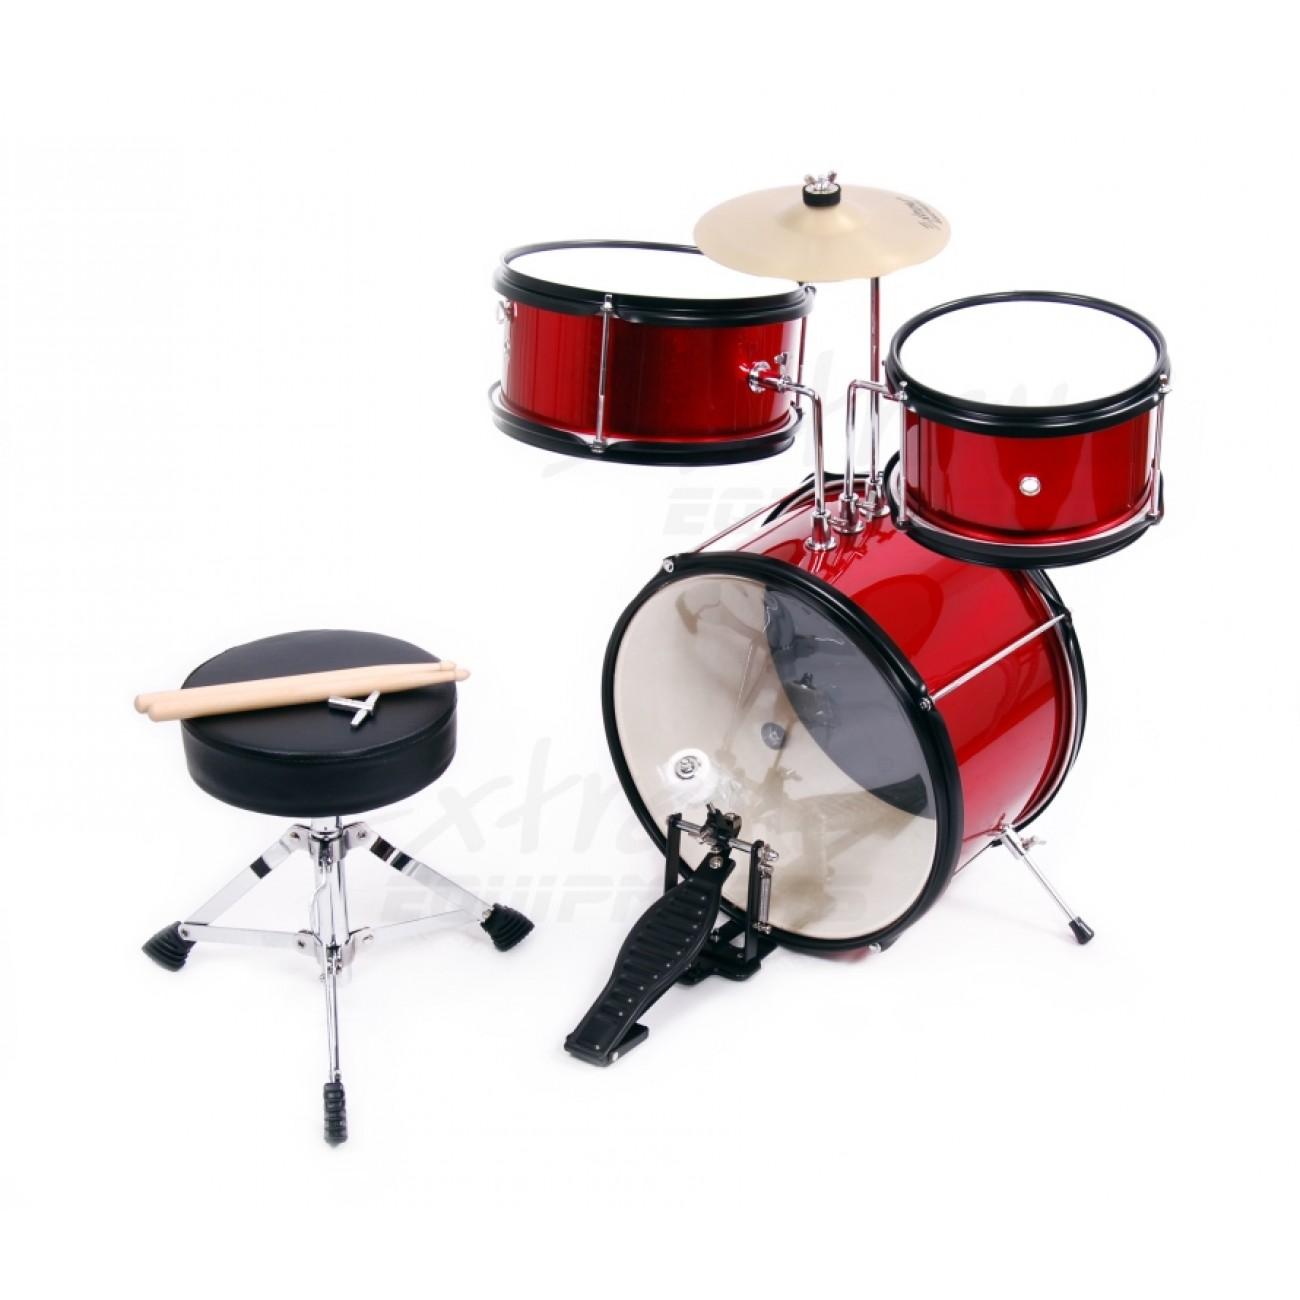 3-yas-muzik-aletleri